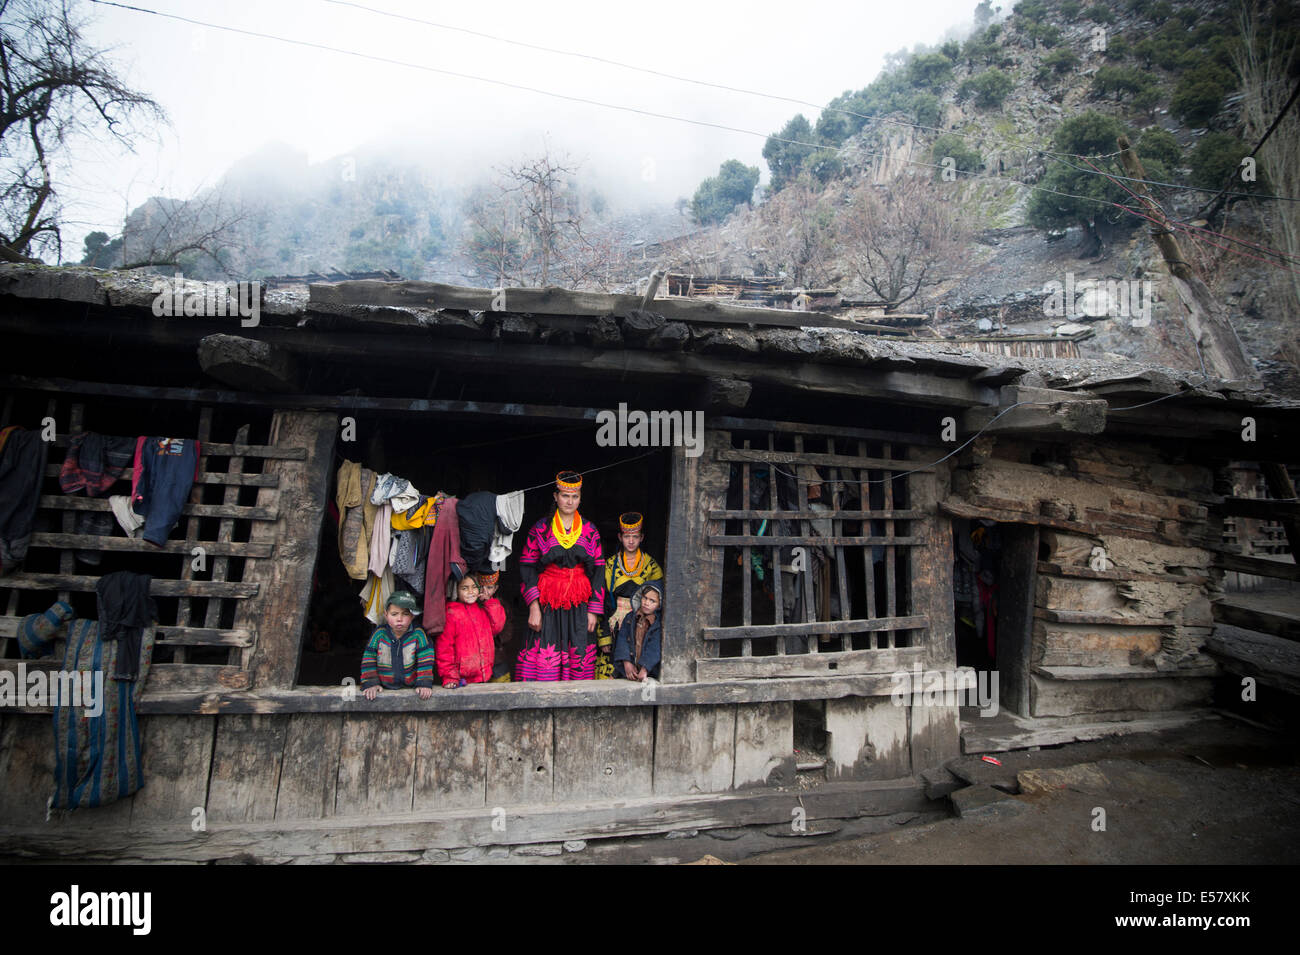 Pic Shows Kalasha  People of Pakistan  Chitral District Khyber Pakhtunkhwa province - Stock Image